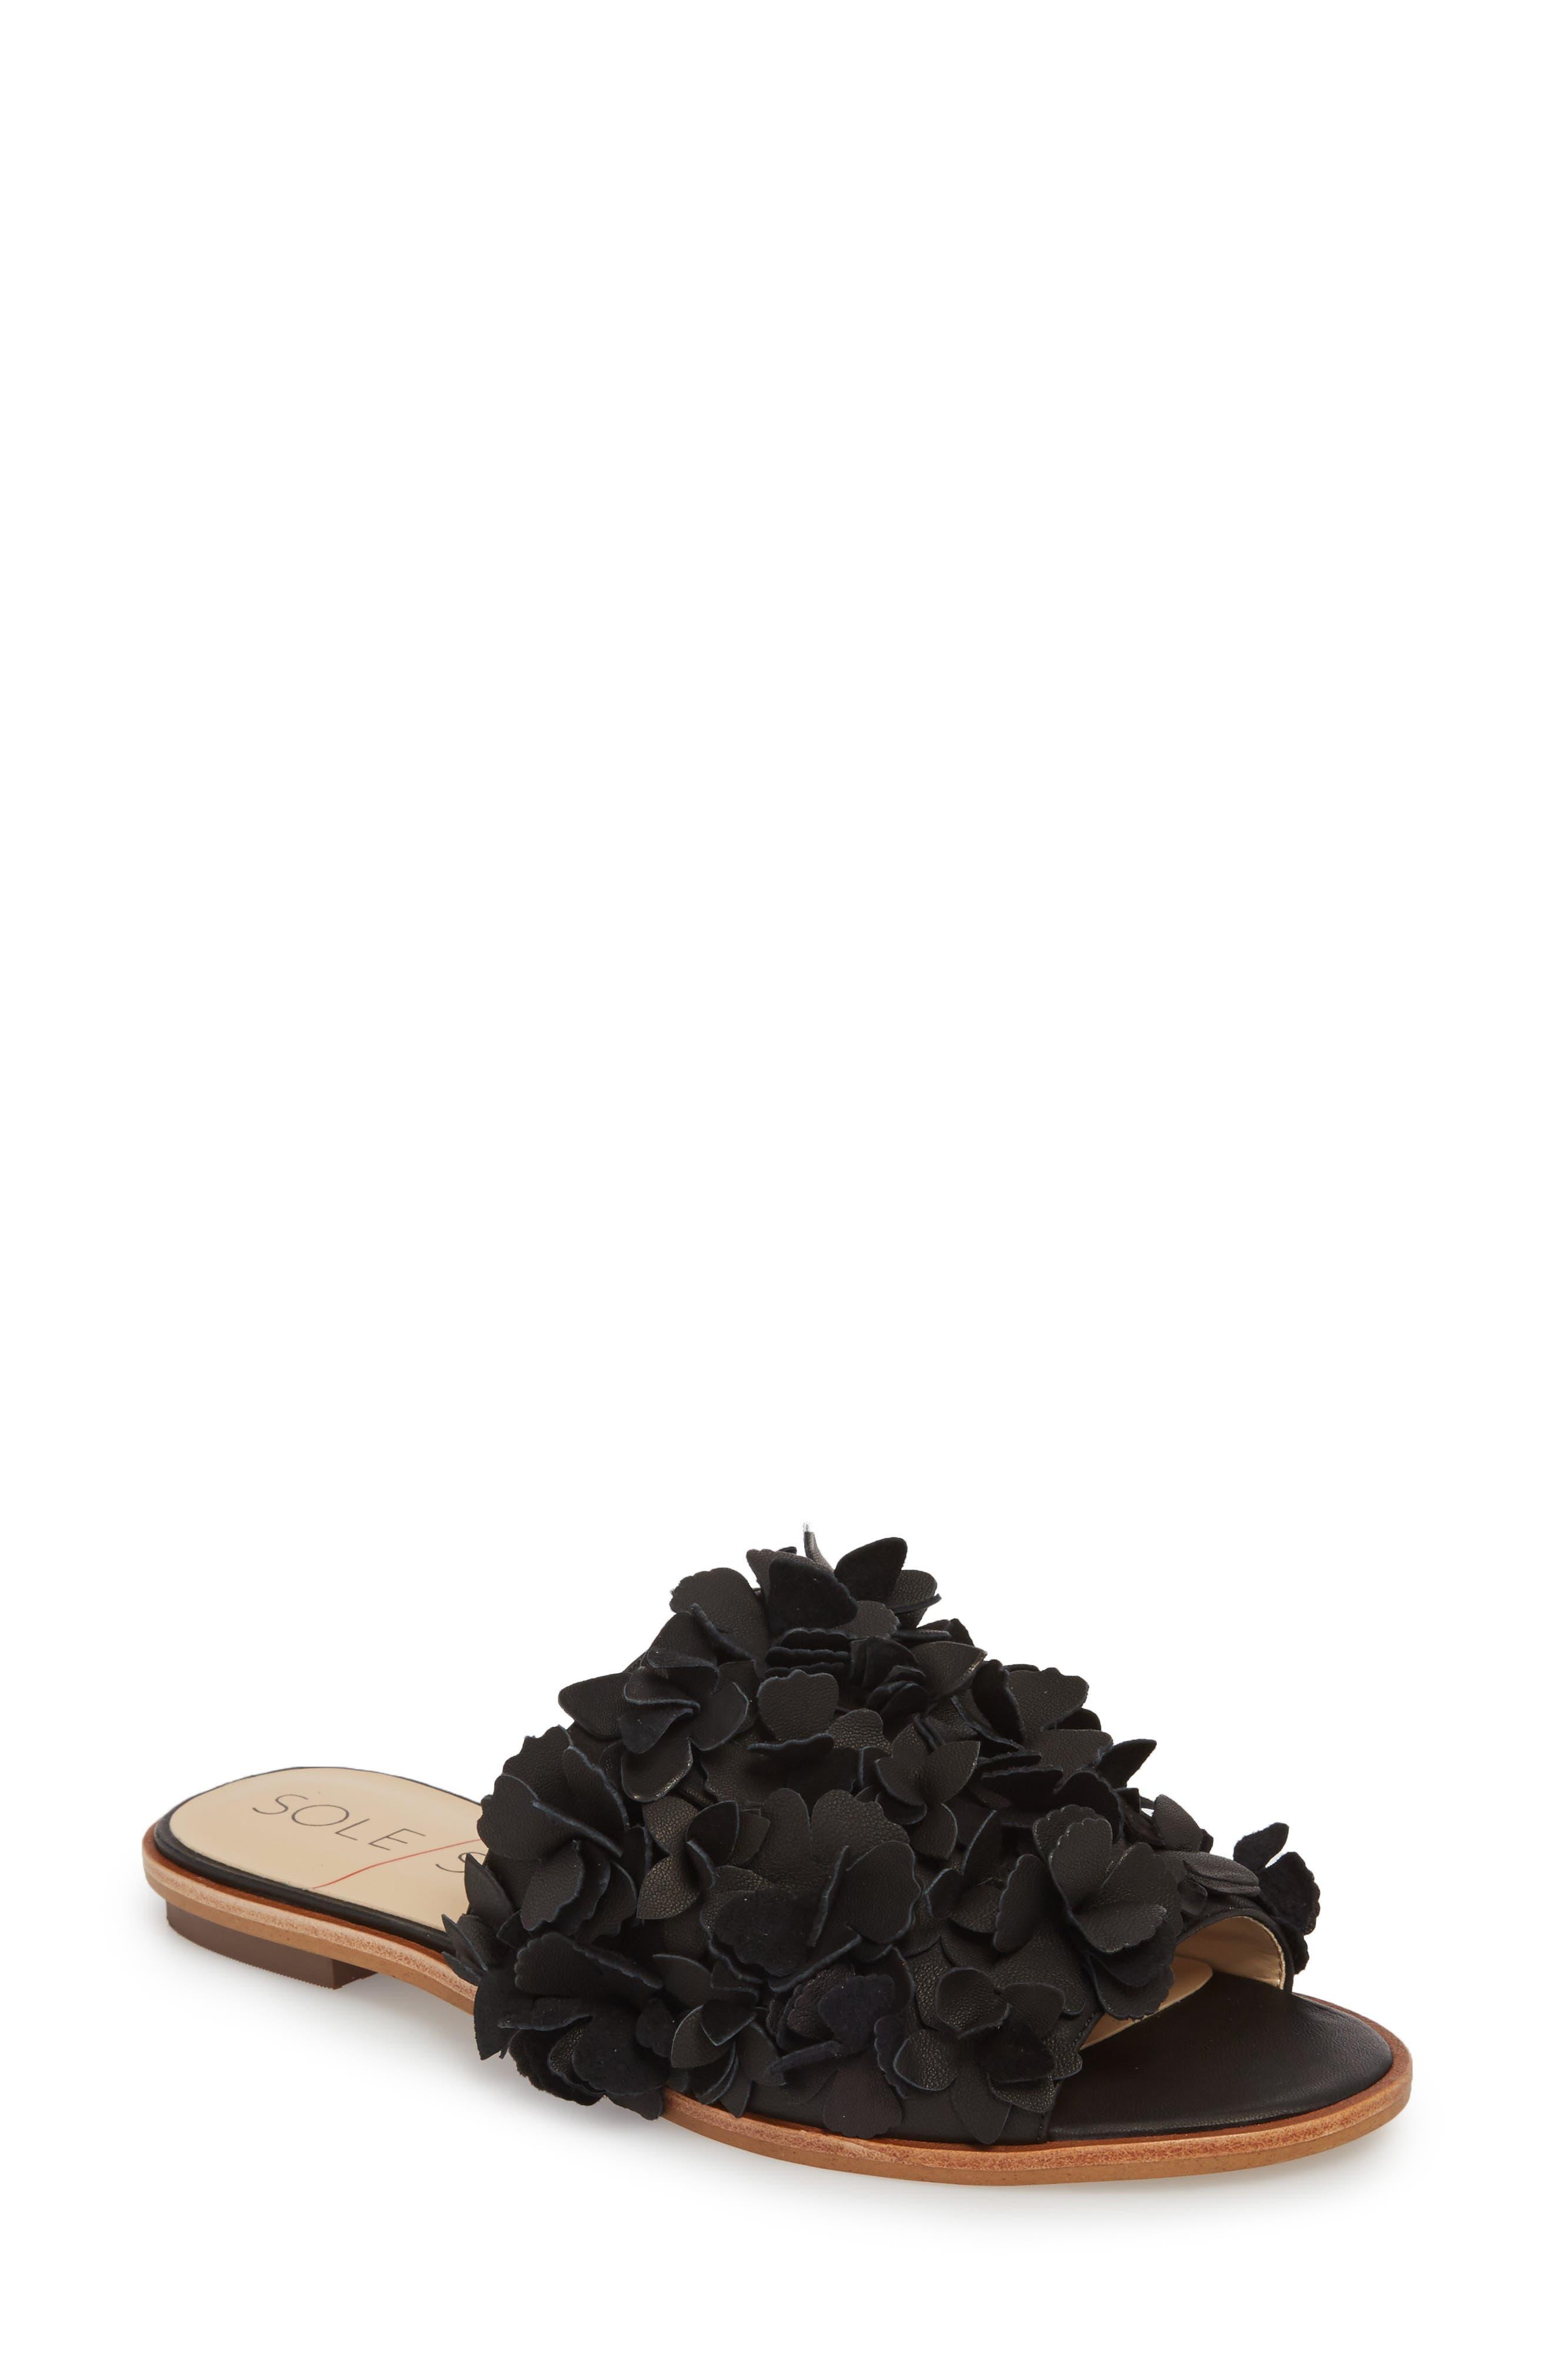 Caelyn Embellished Flat Sandal,                             Main thumbnail 1, color,                             BLACK